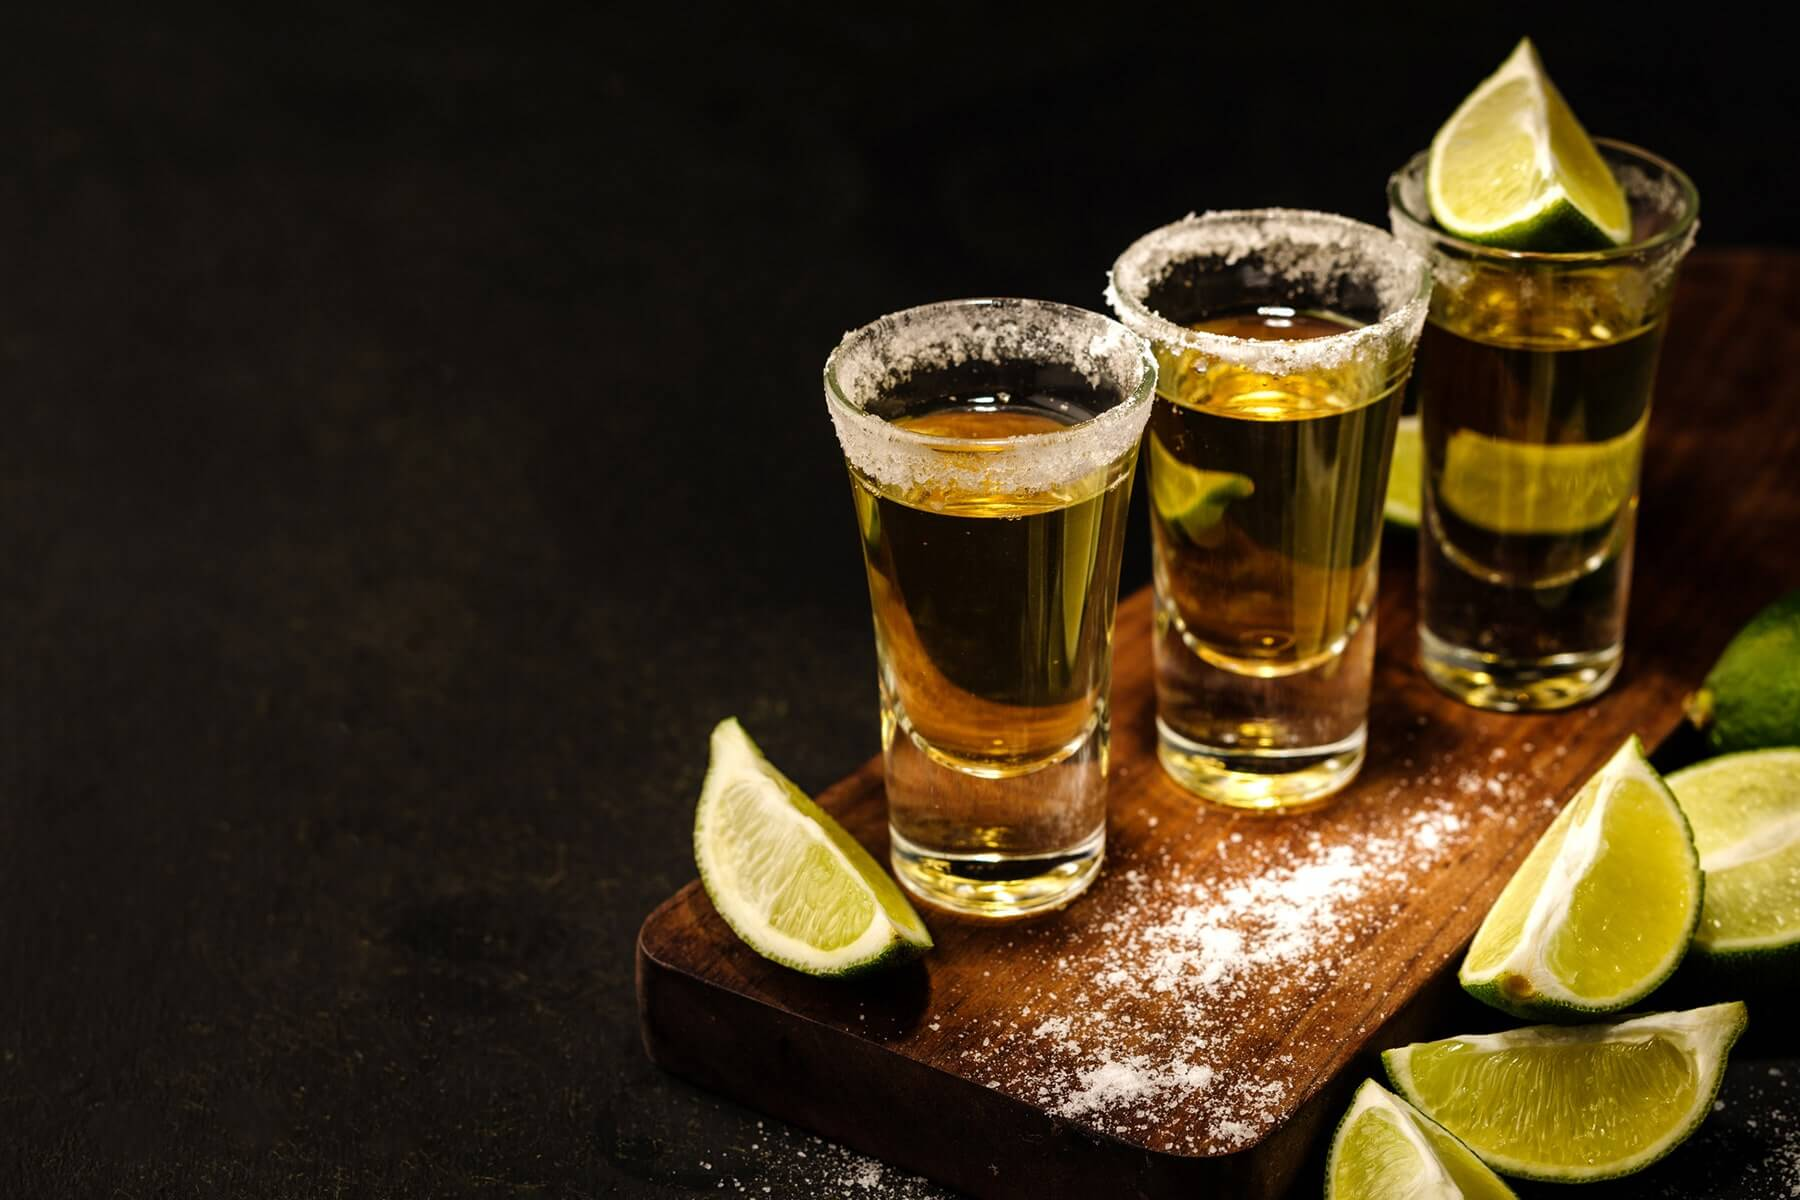 El tequila es una bebida mexicana